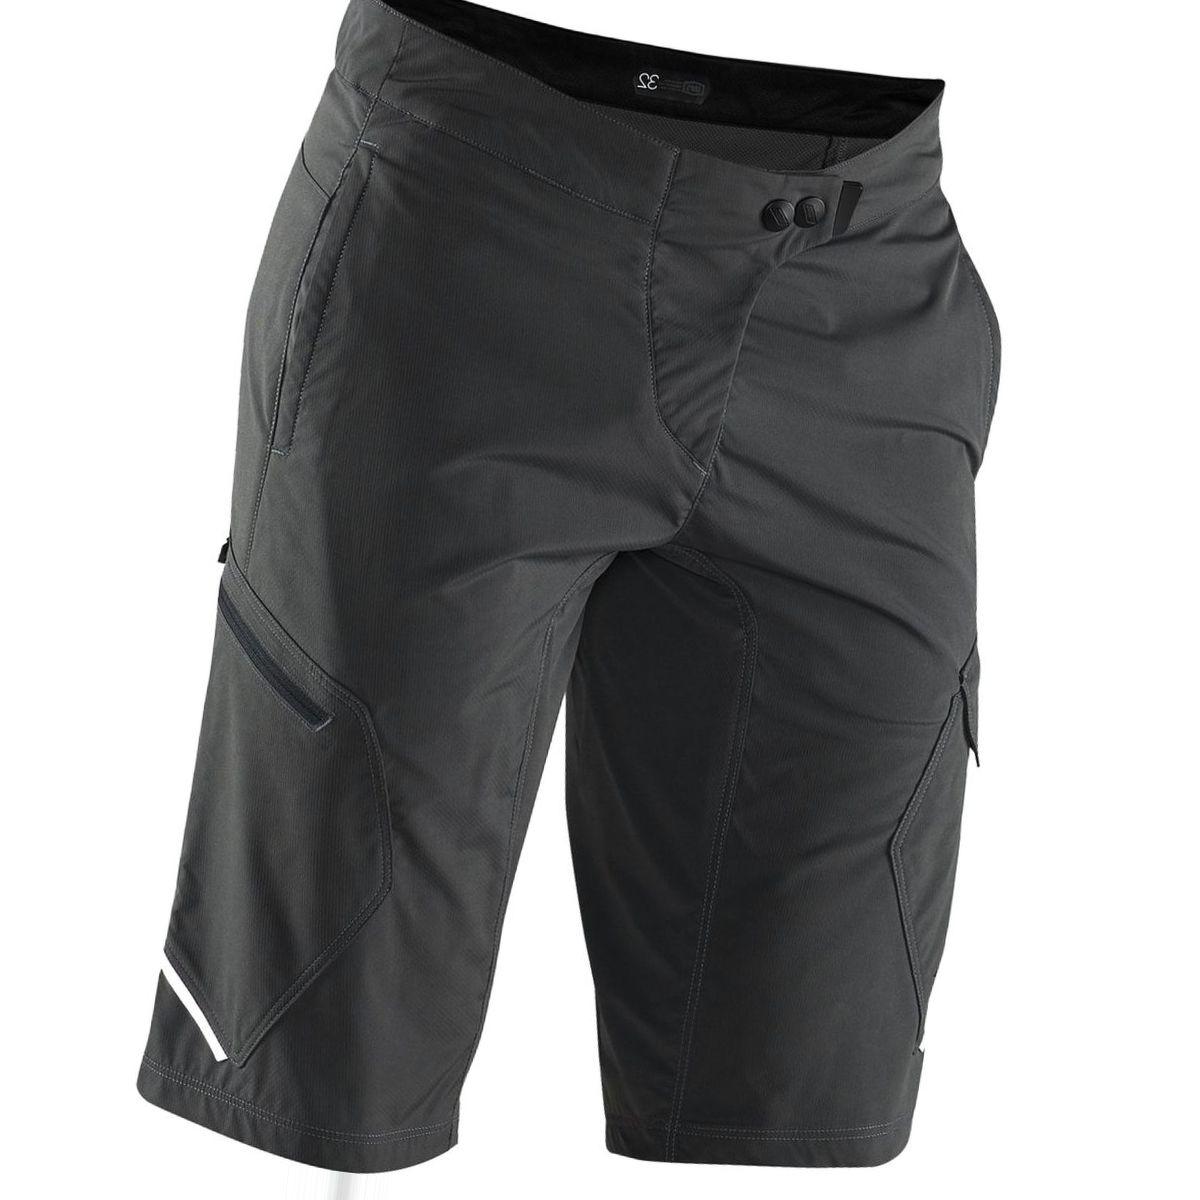 100% Ridecamp Short - Men's